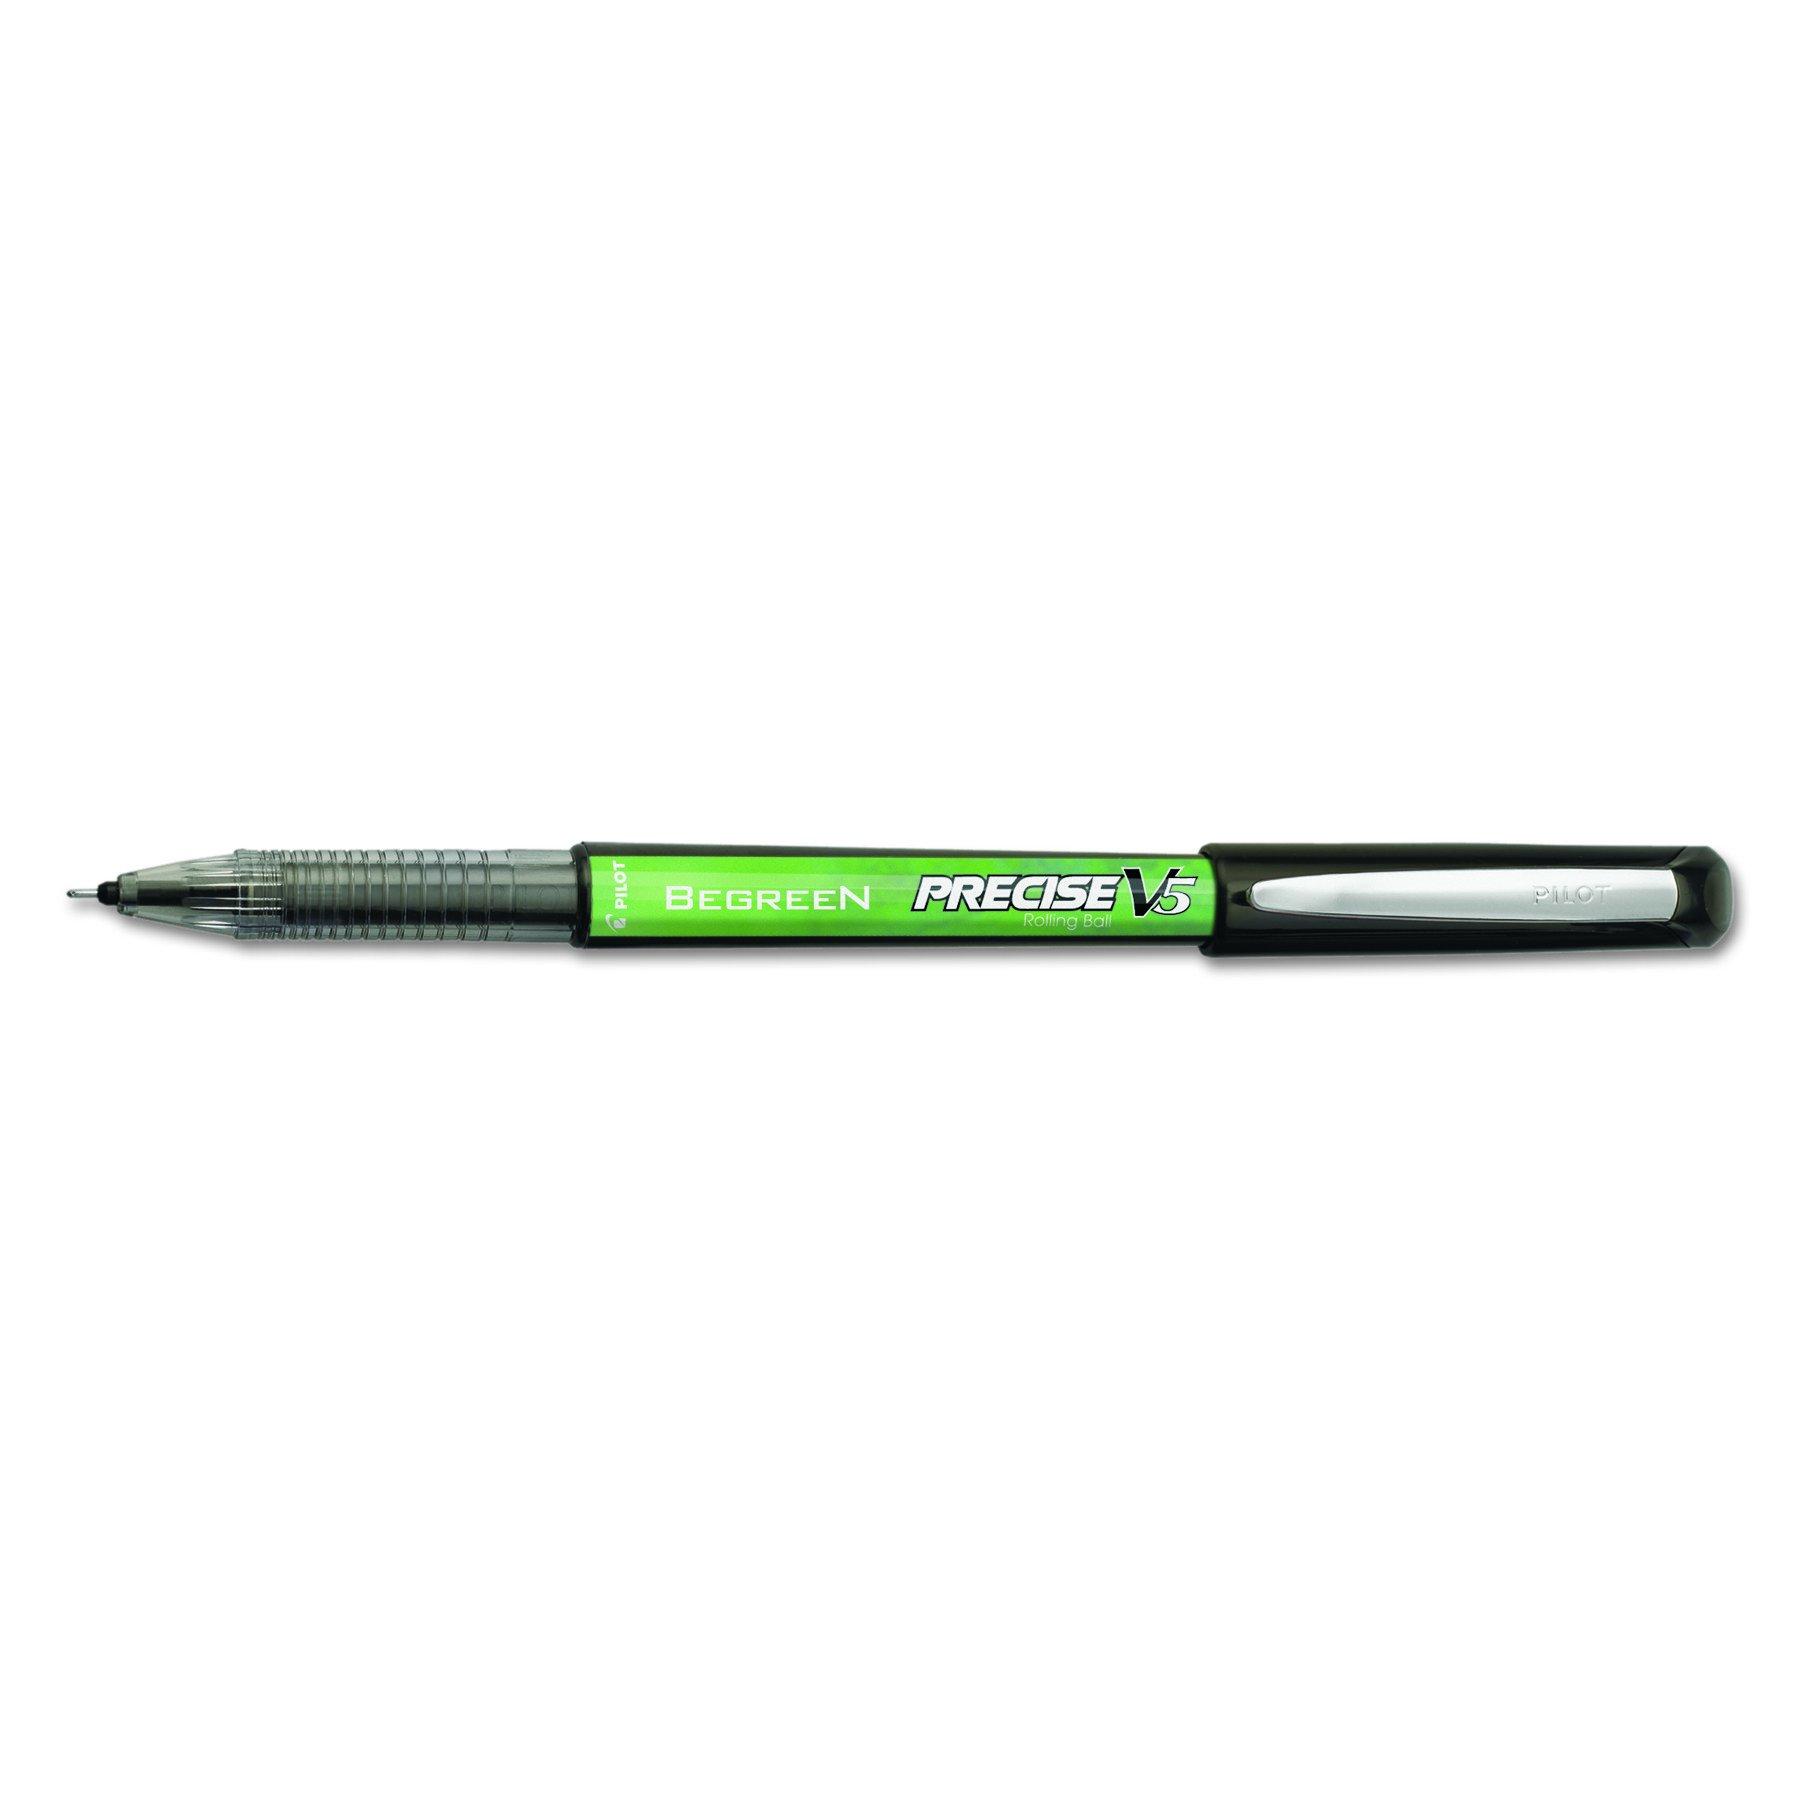 12 x Pilot Precise V5 BeGreen Rolling Ball Pens, Capped